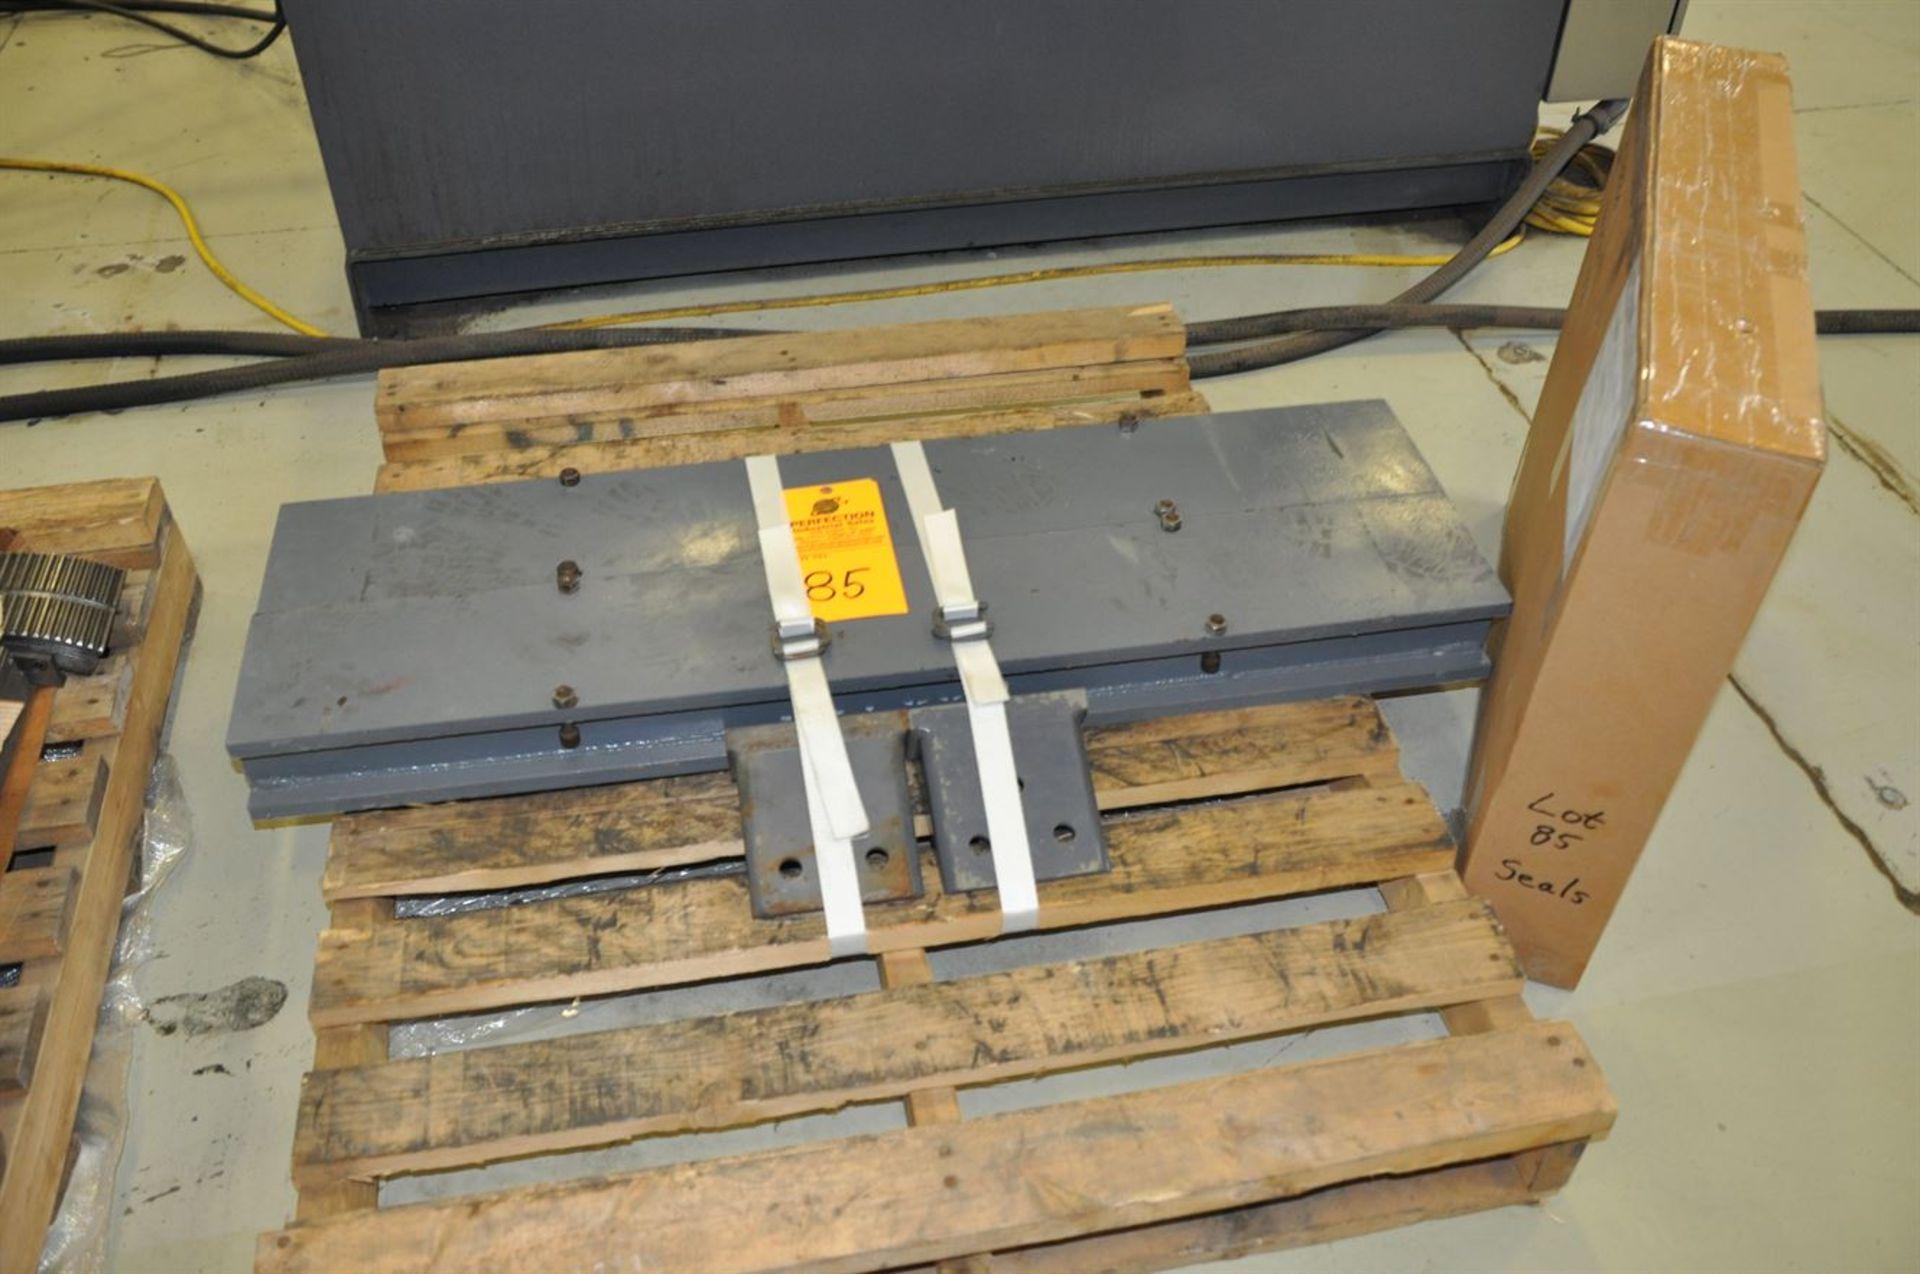 "2012 McCOY CLEBU 1500 15"" Type III Bucking Unit, s/n 8988, w/ PLC Control, Size Range: 15"" – 2. - Image 6 of 6"